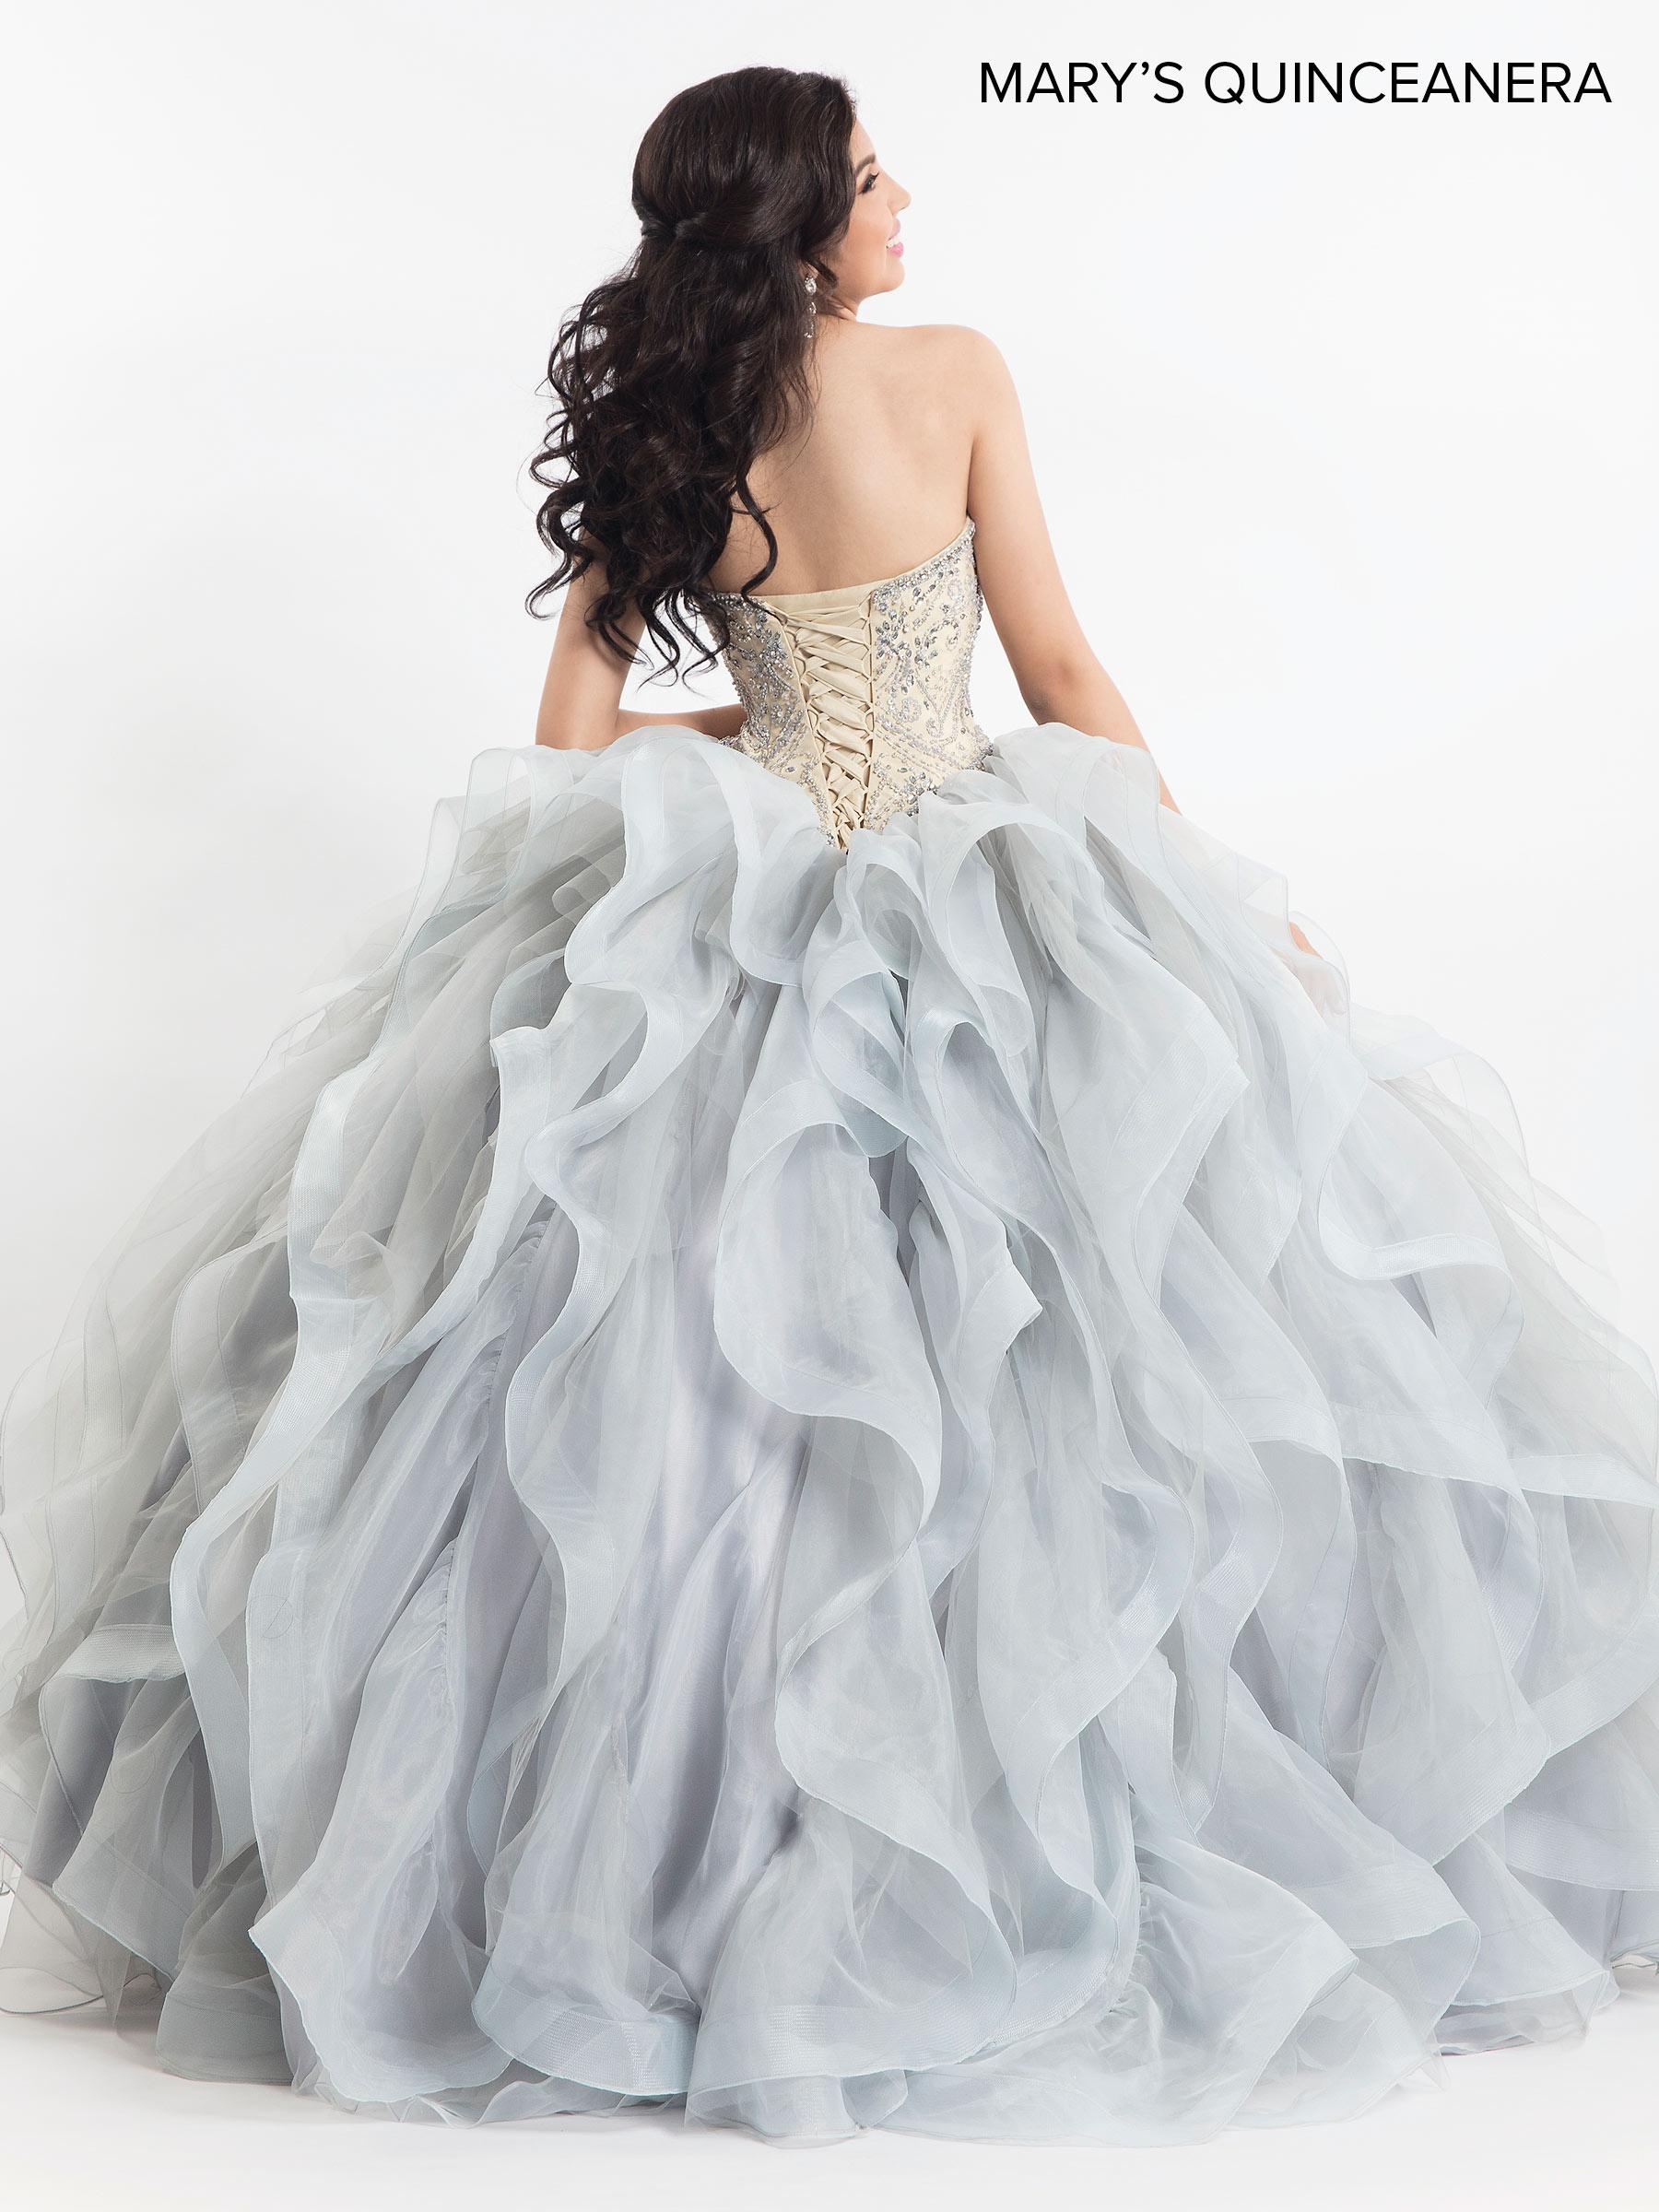 Lareina Quinceanera Dresses | La Reina | Style - MQ2023